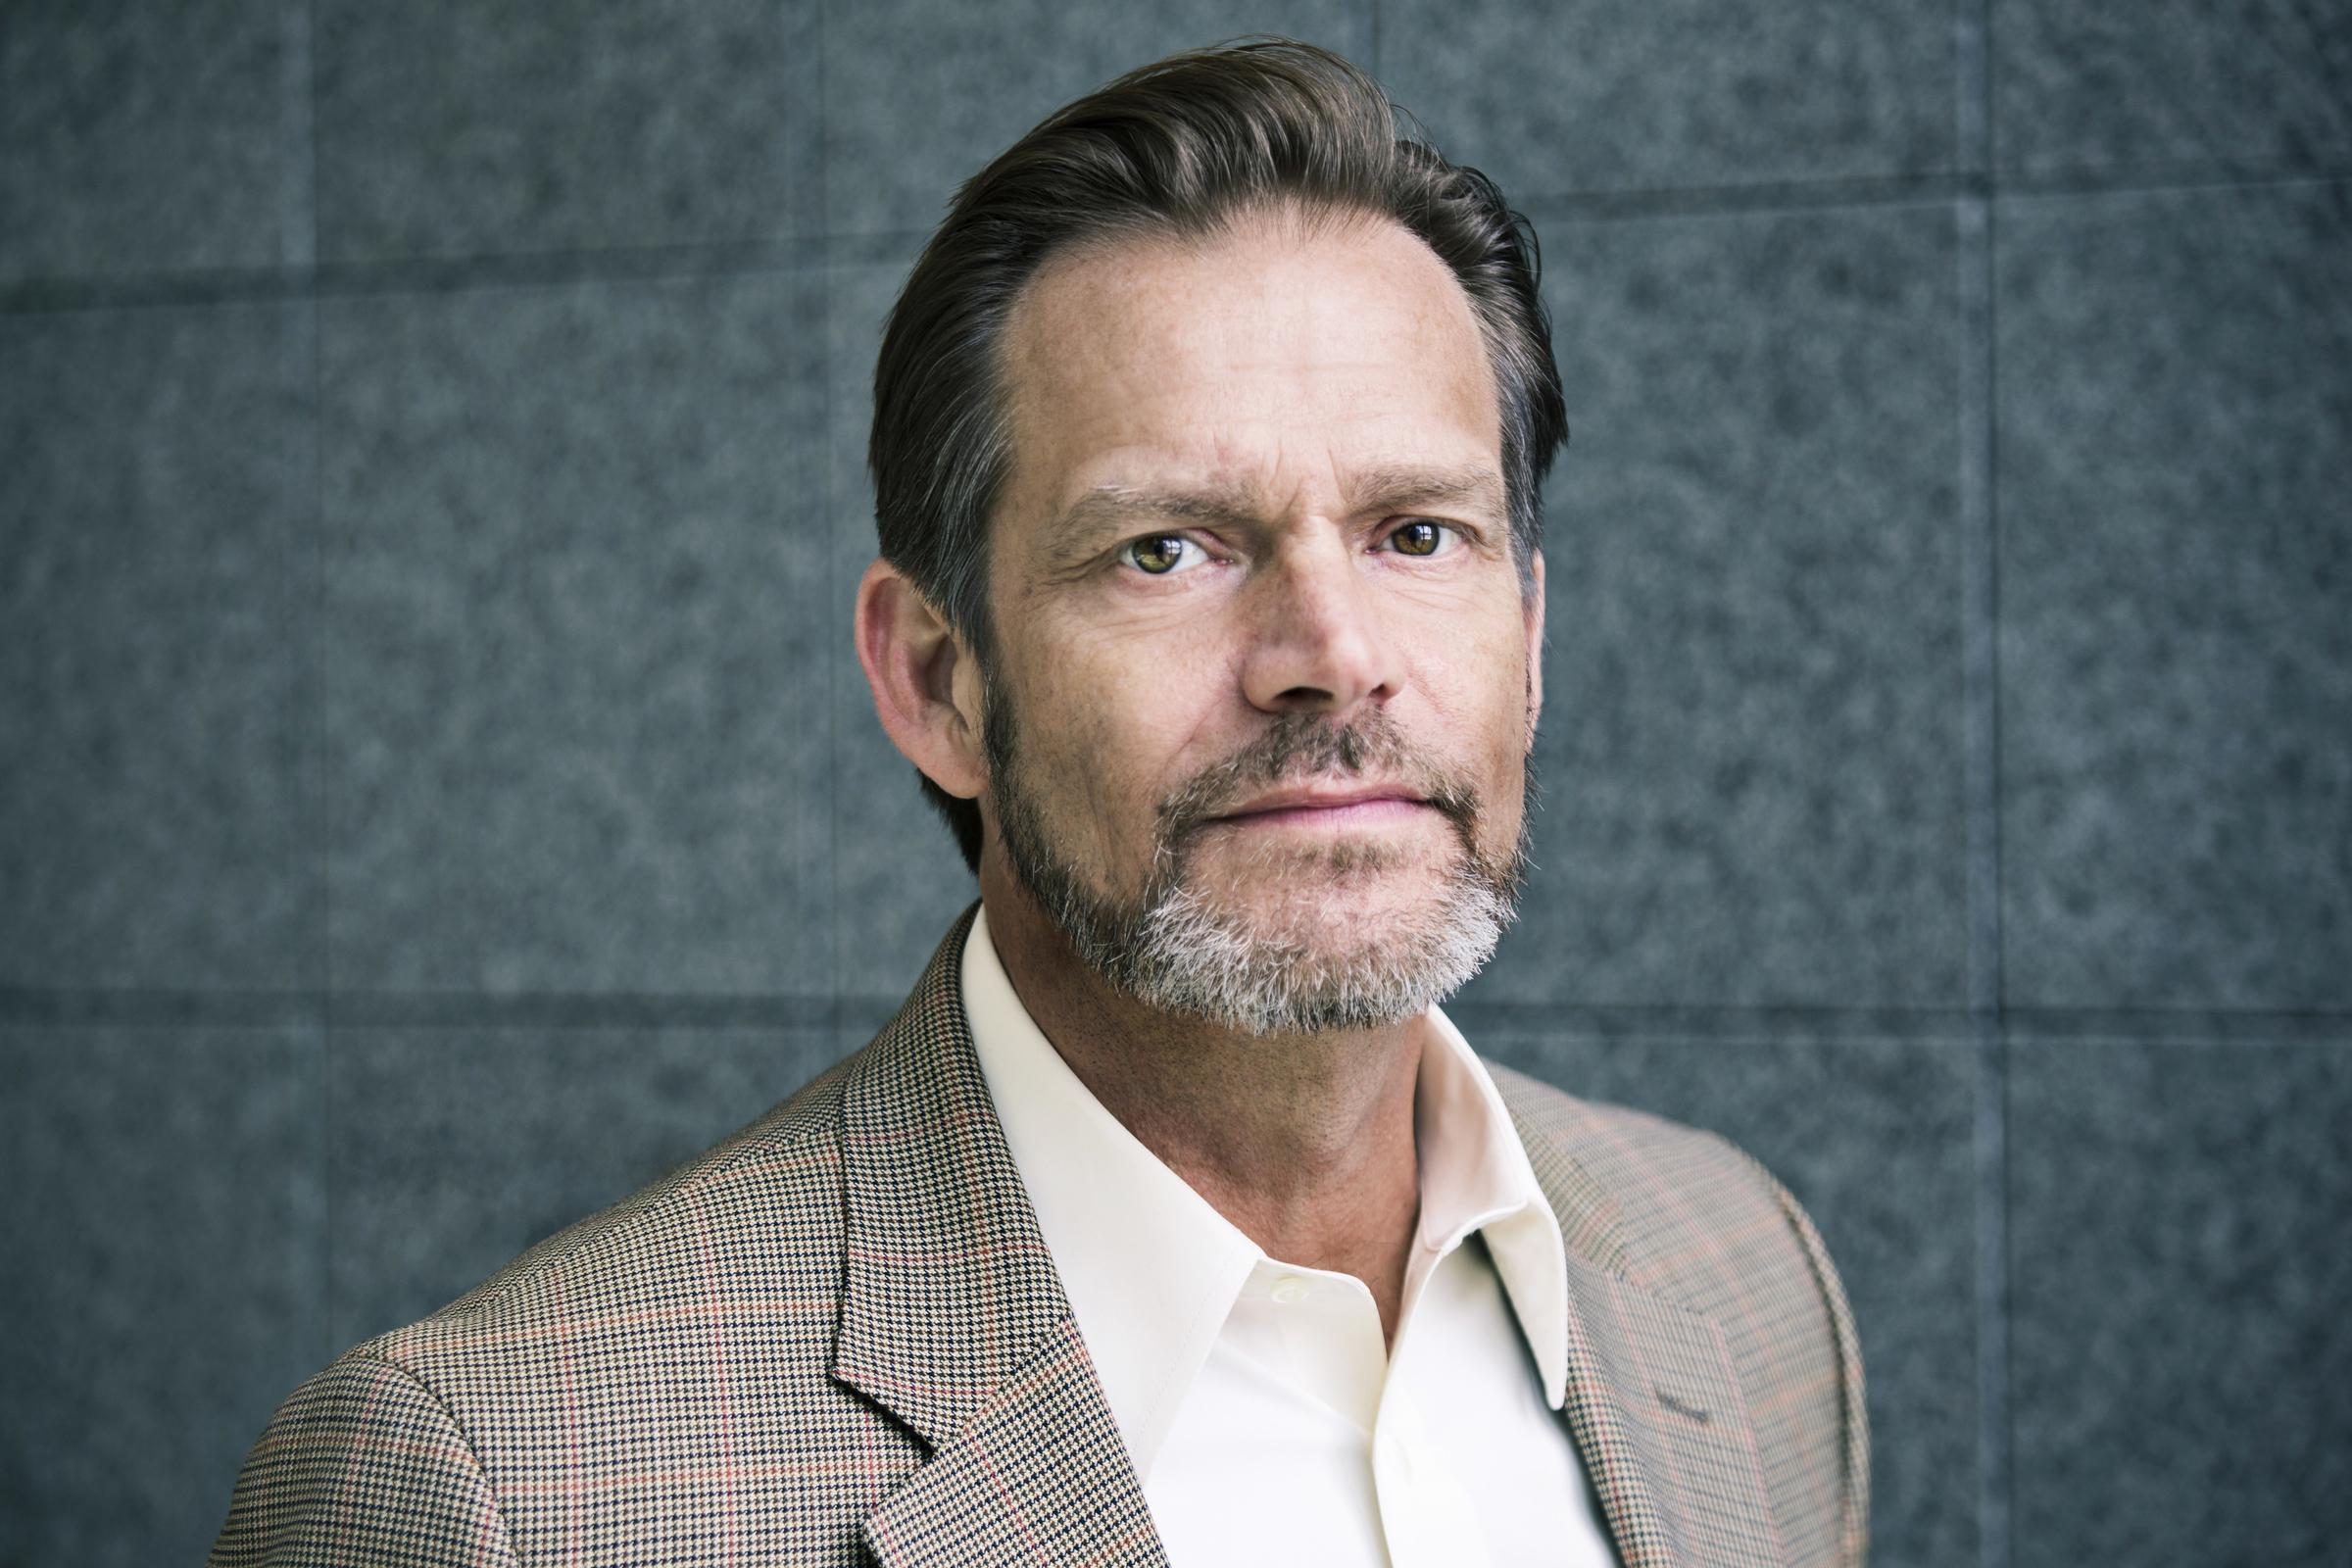 Mark Benninghofen (Flan Kittredge)